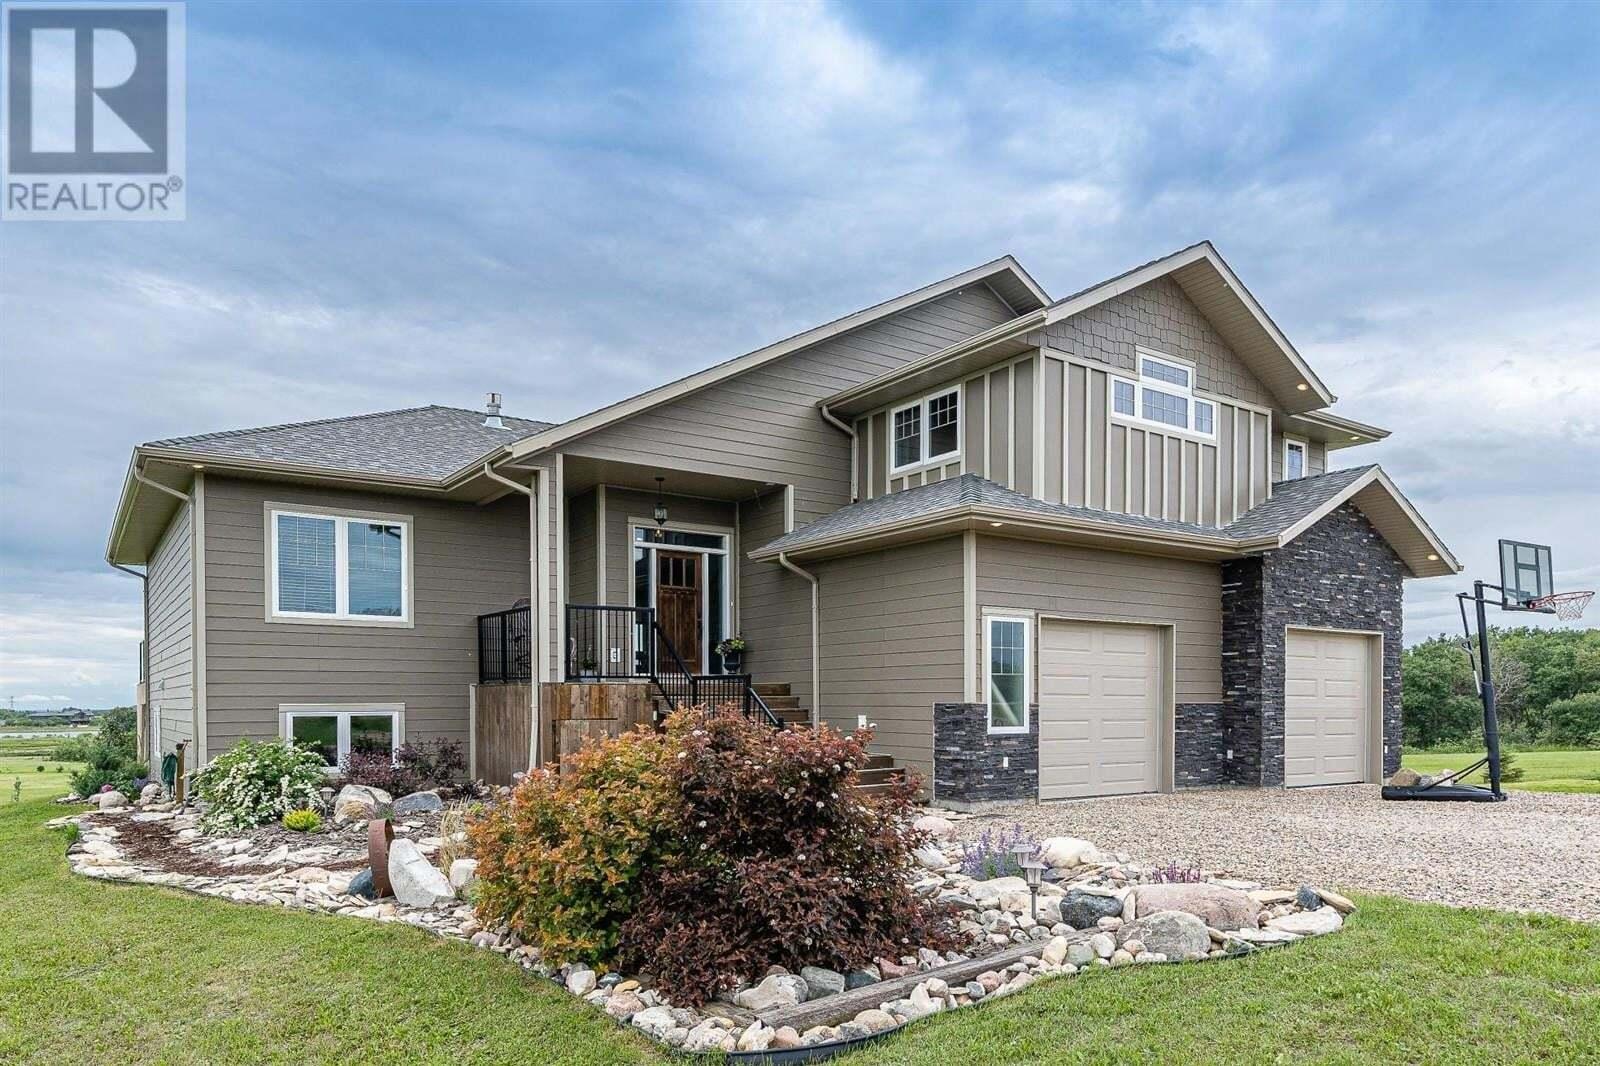 House for sale at 119 Valley Dr Aberdeen Rm No. 373 Saskatchewan - MLS: SK817215